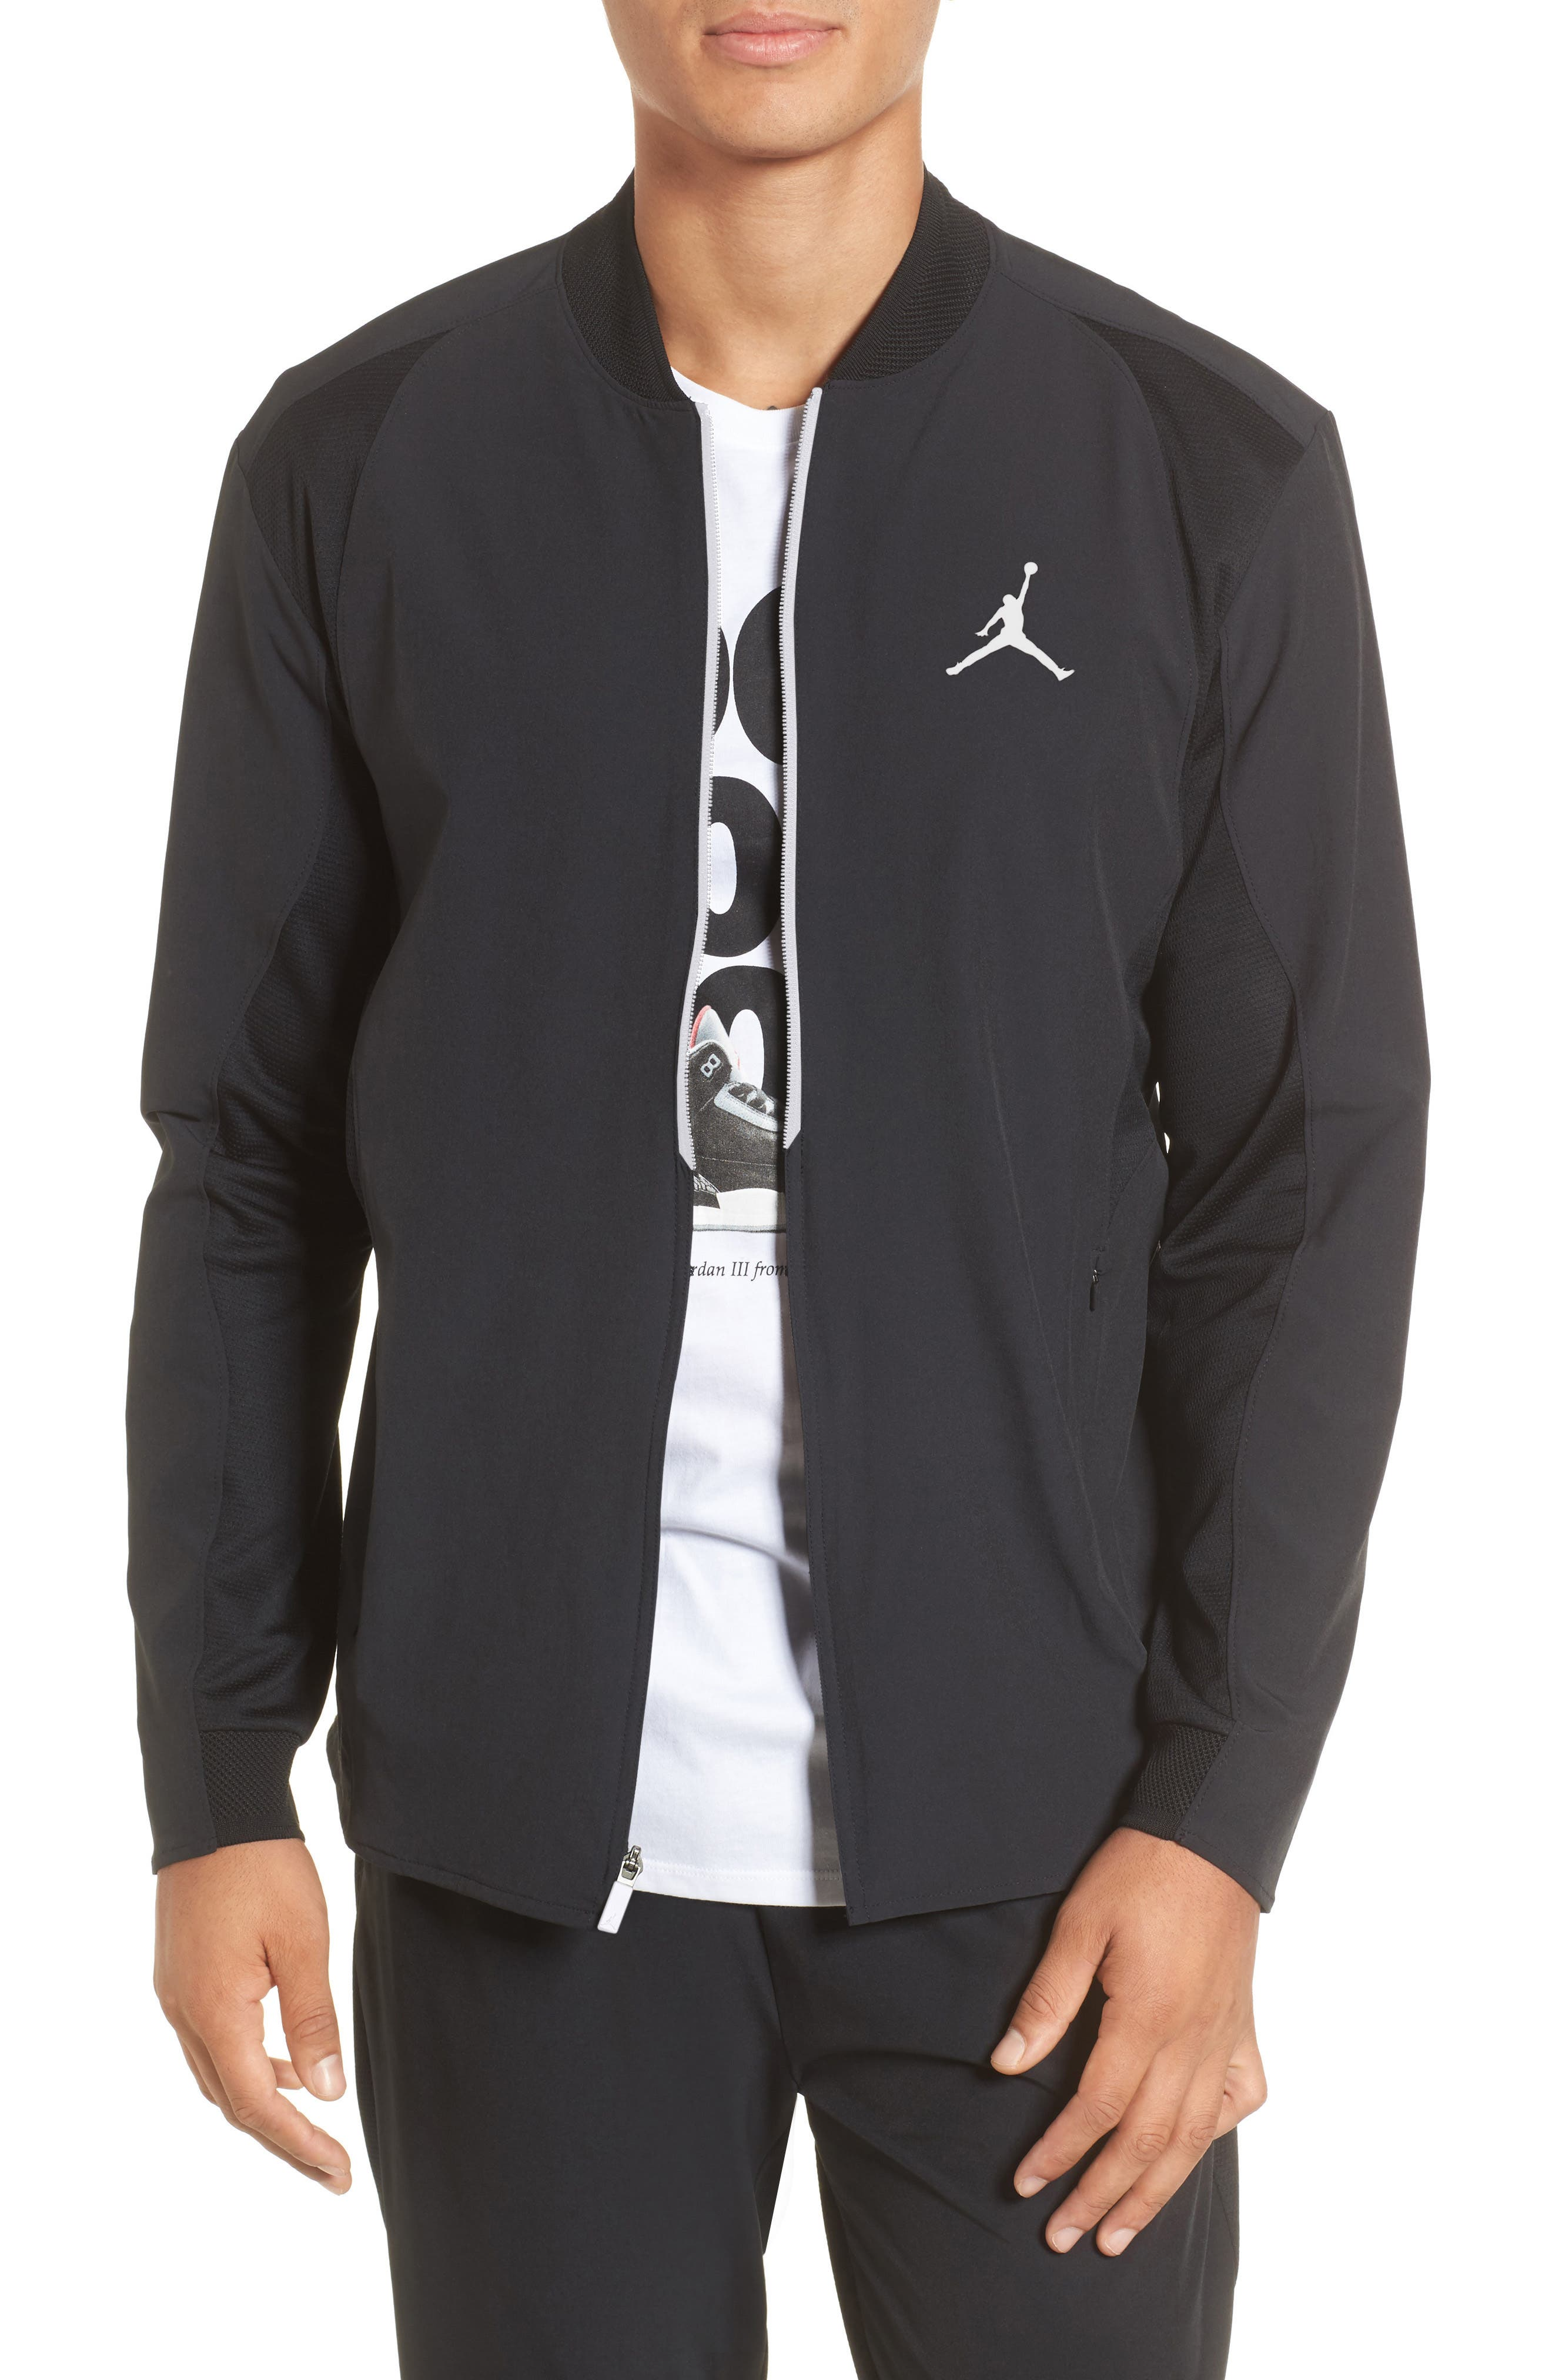 23 Alpha Dry Jacket,                             Main thumbnail 1, color,                             010